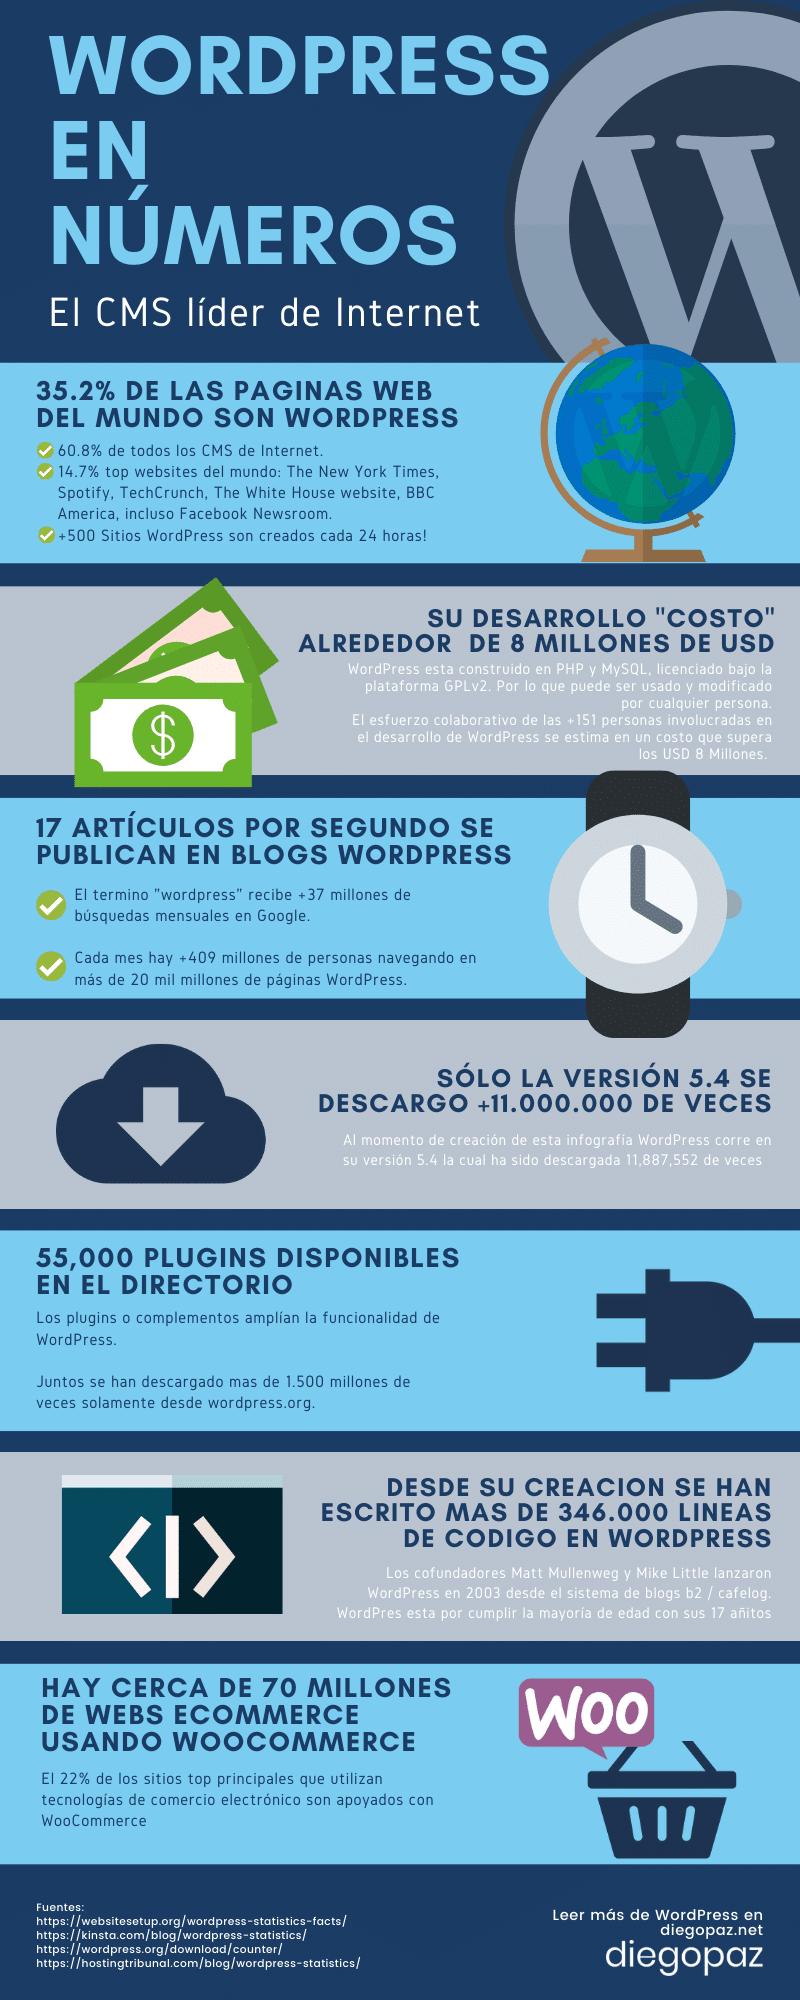 Infografia wordPress numeros